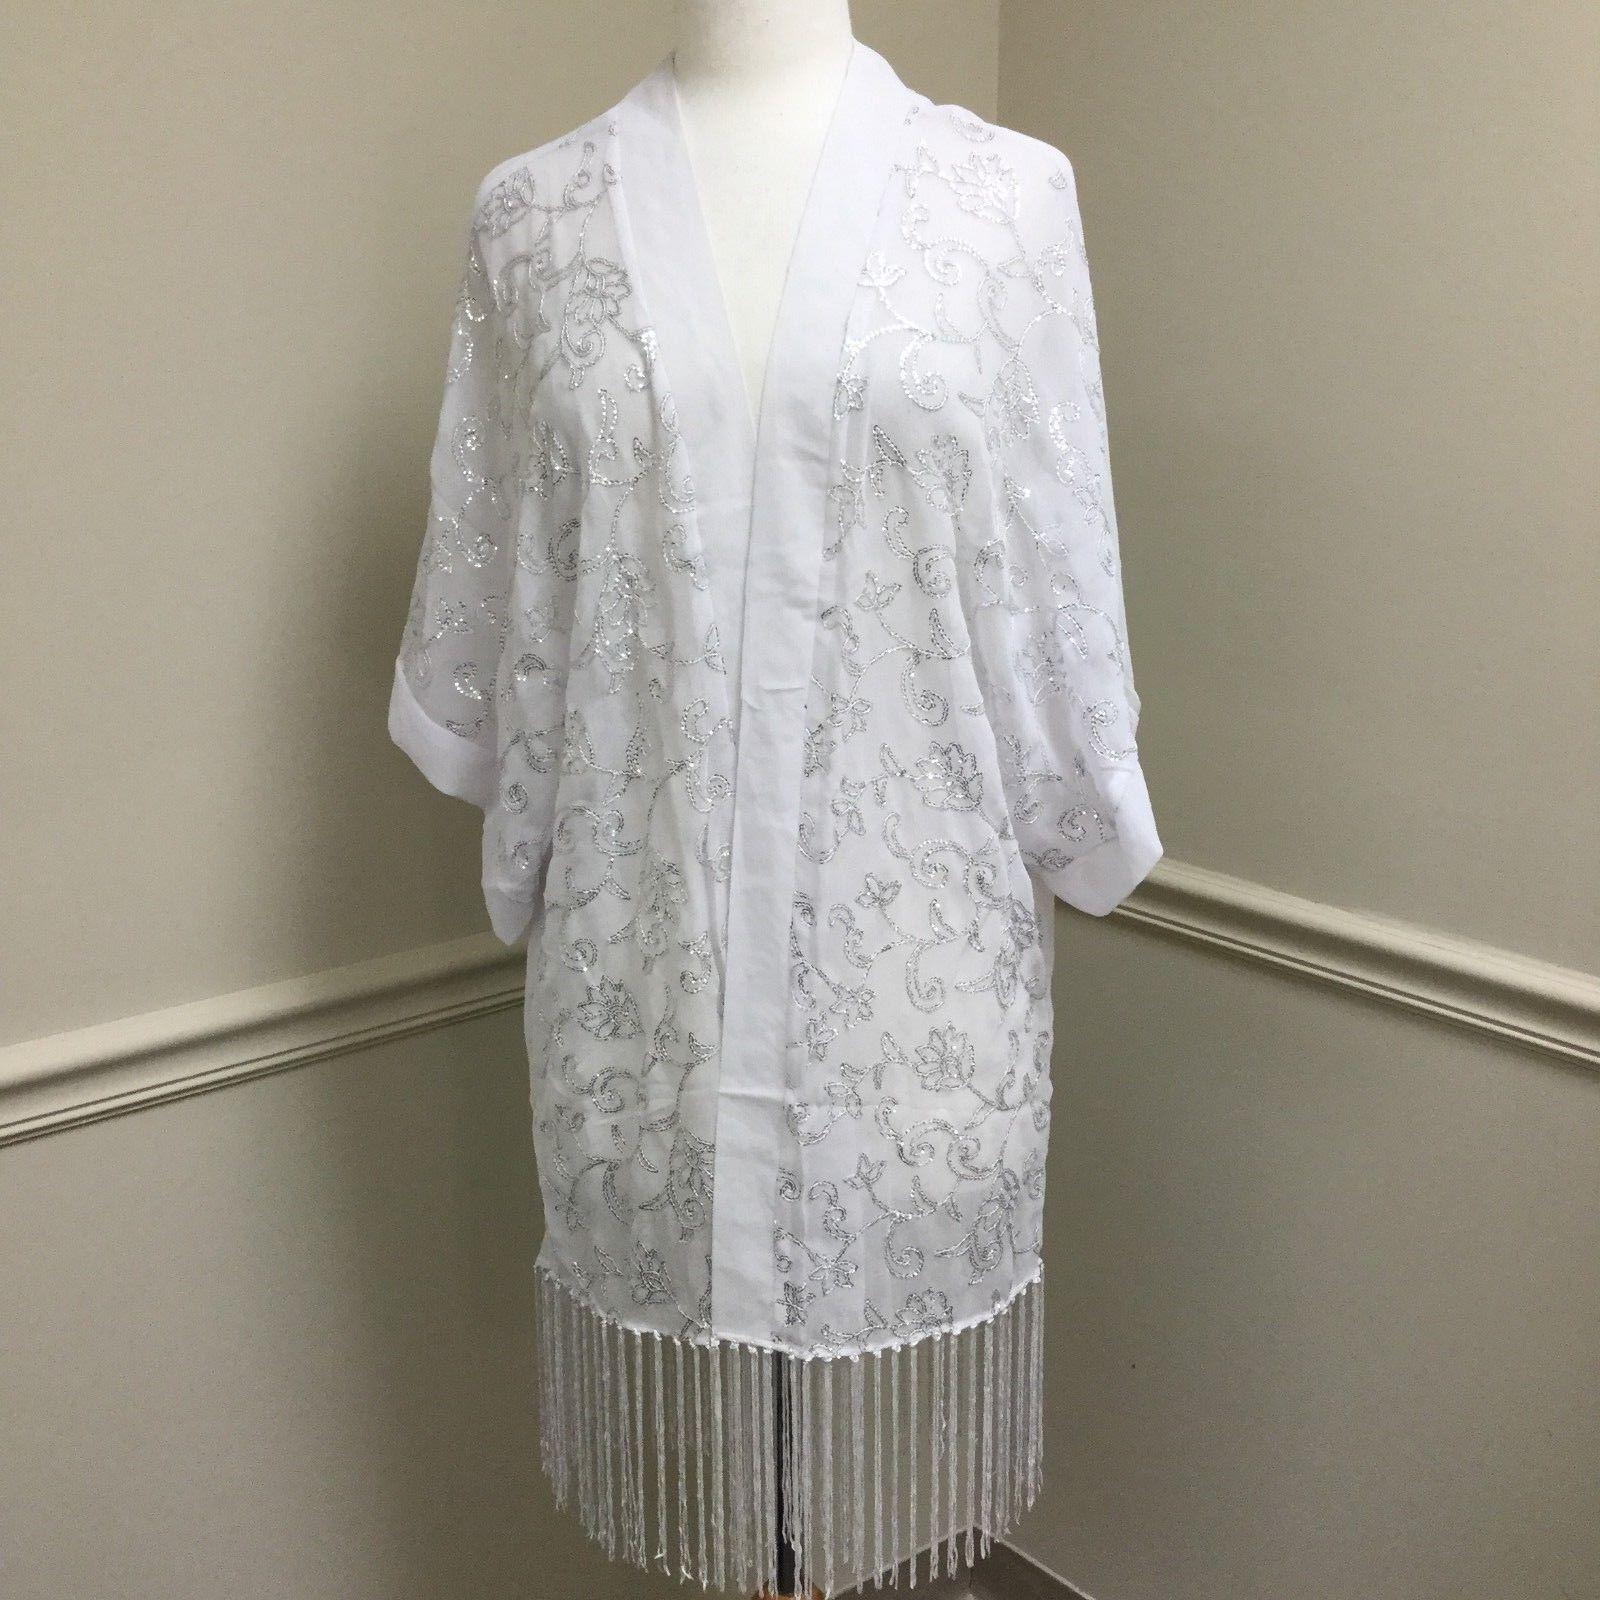 Blue by Betsey Johnson White Beach Wedding Bridesmaid Chiffon Kimono Robe Sequin